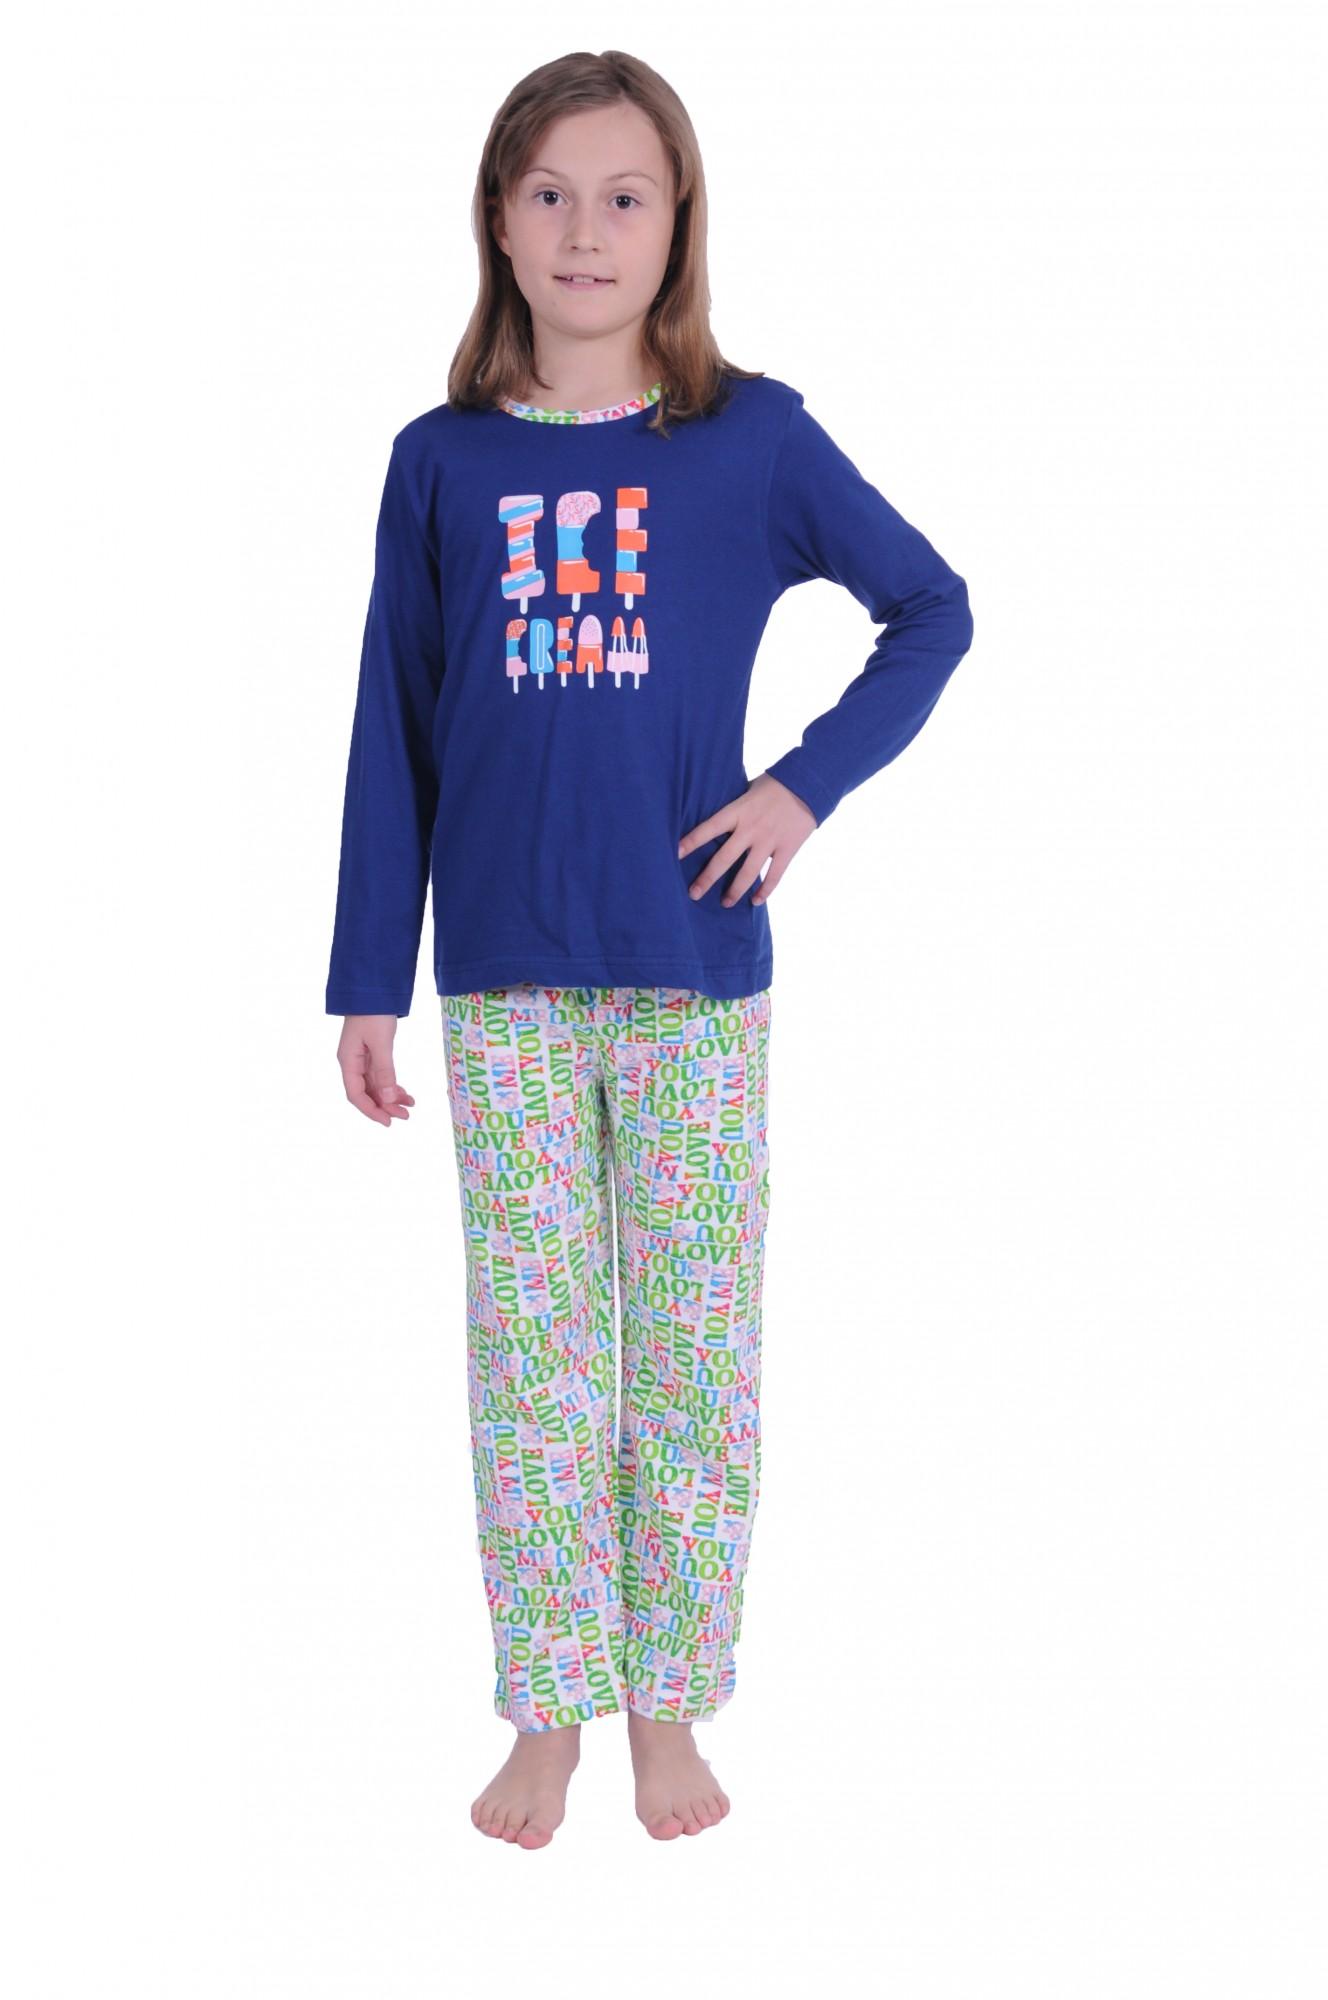 Cooler Mädchen Kinder Pyjama langarm in tollen Farben 171 401 90 842